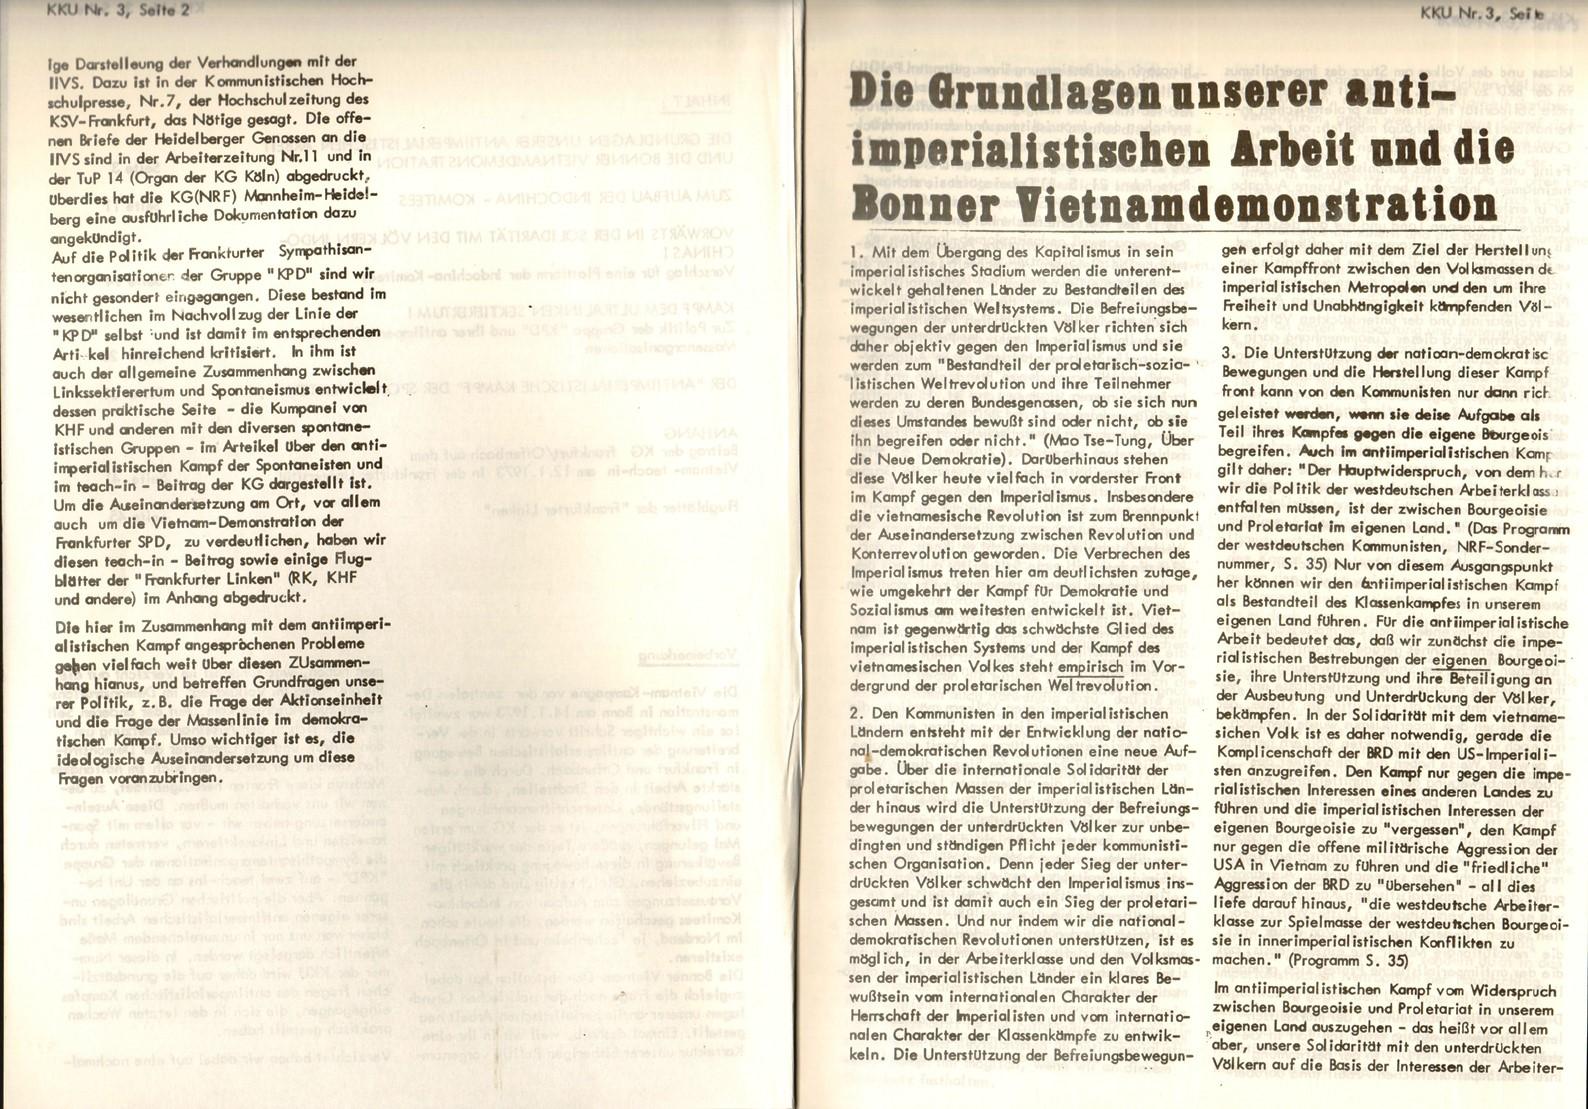 Frankfurt_Offenbach_KG_Kampf_Kritik_Umgestaltung_1973_03_03